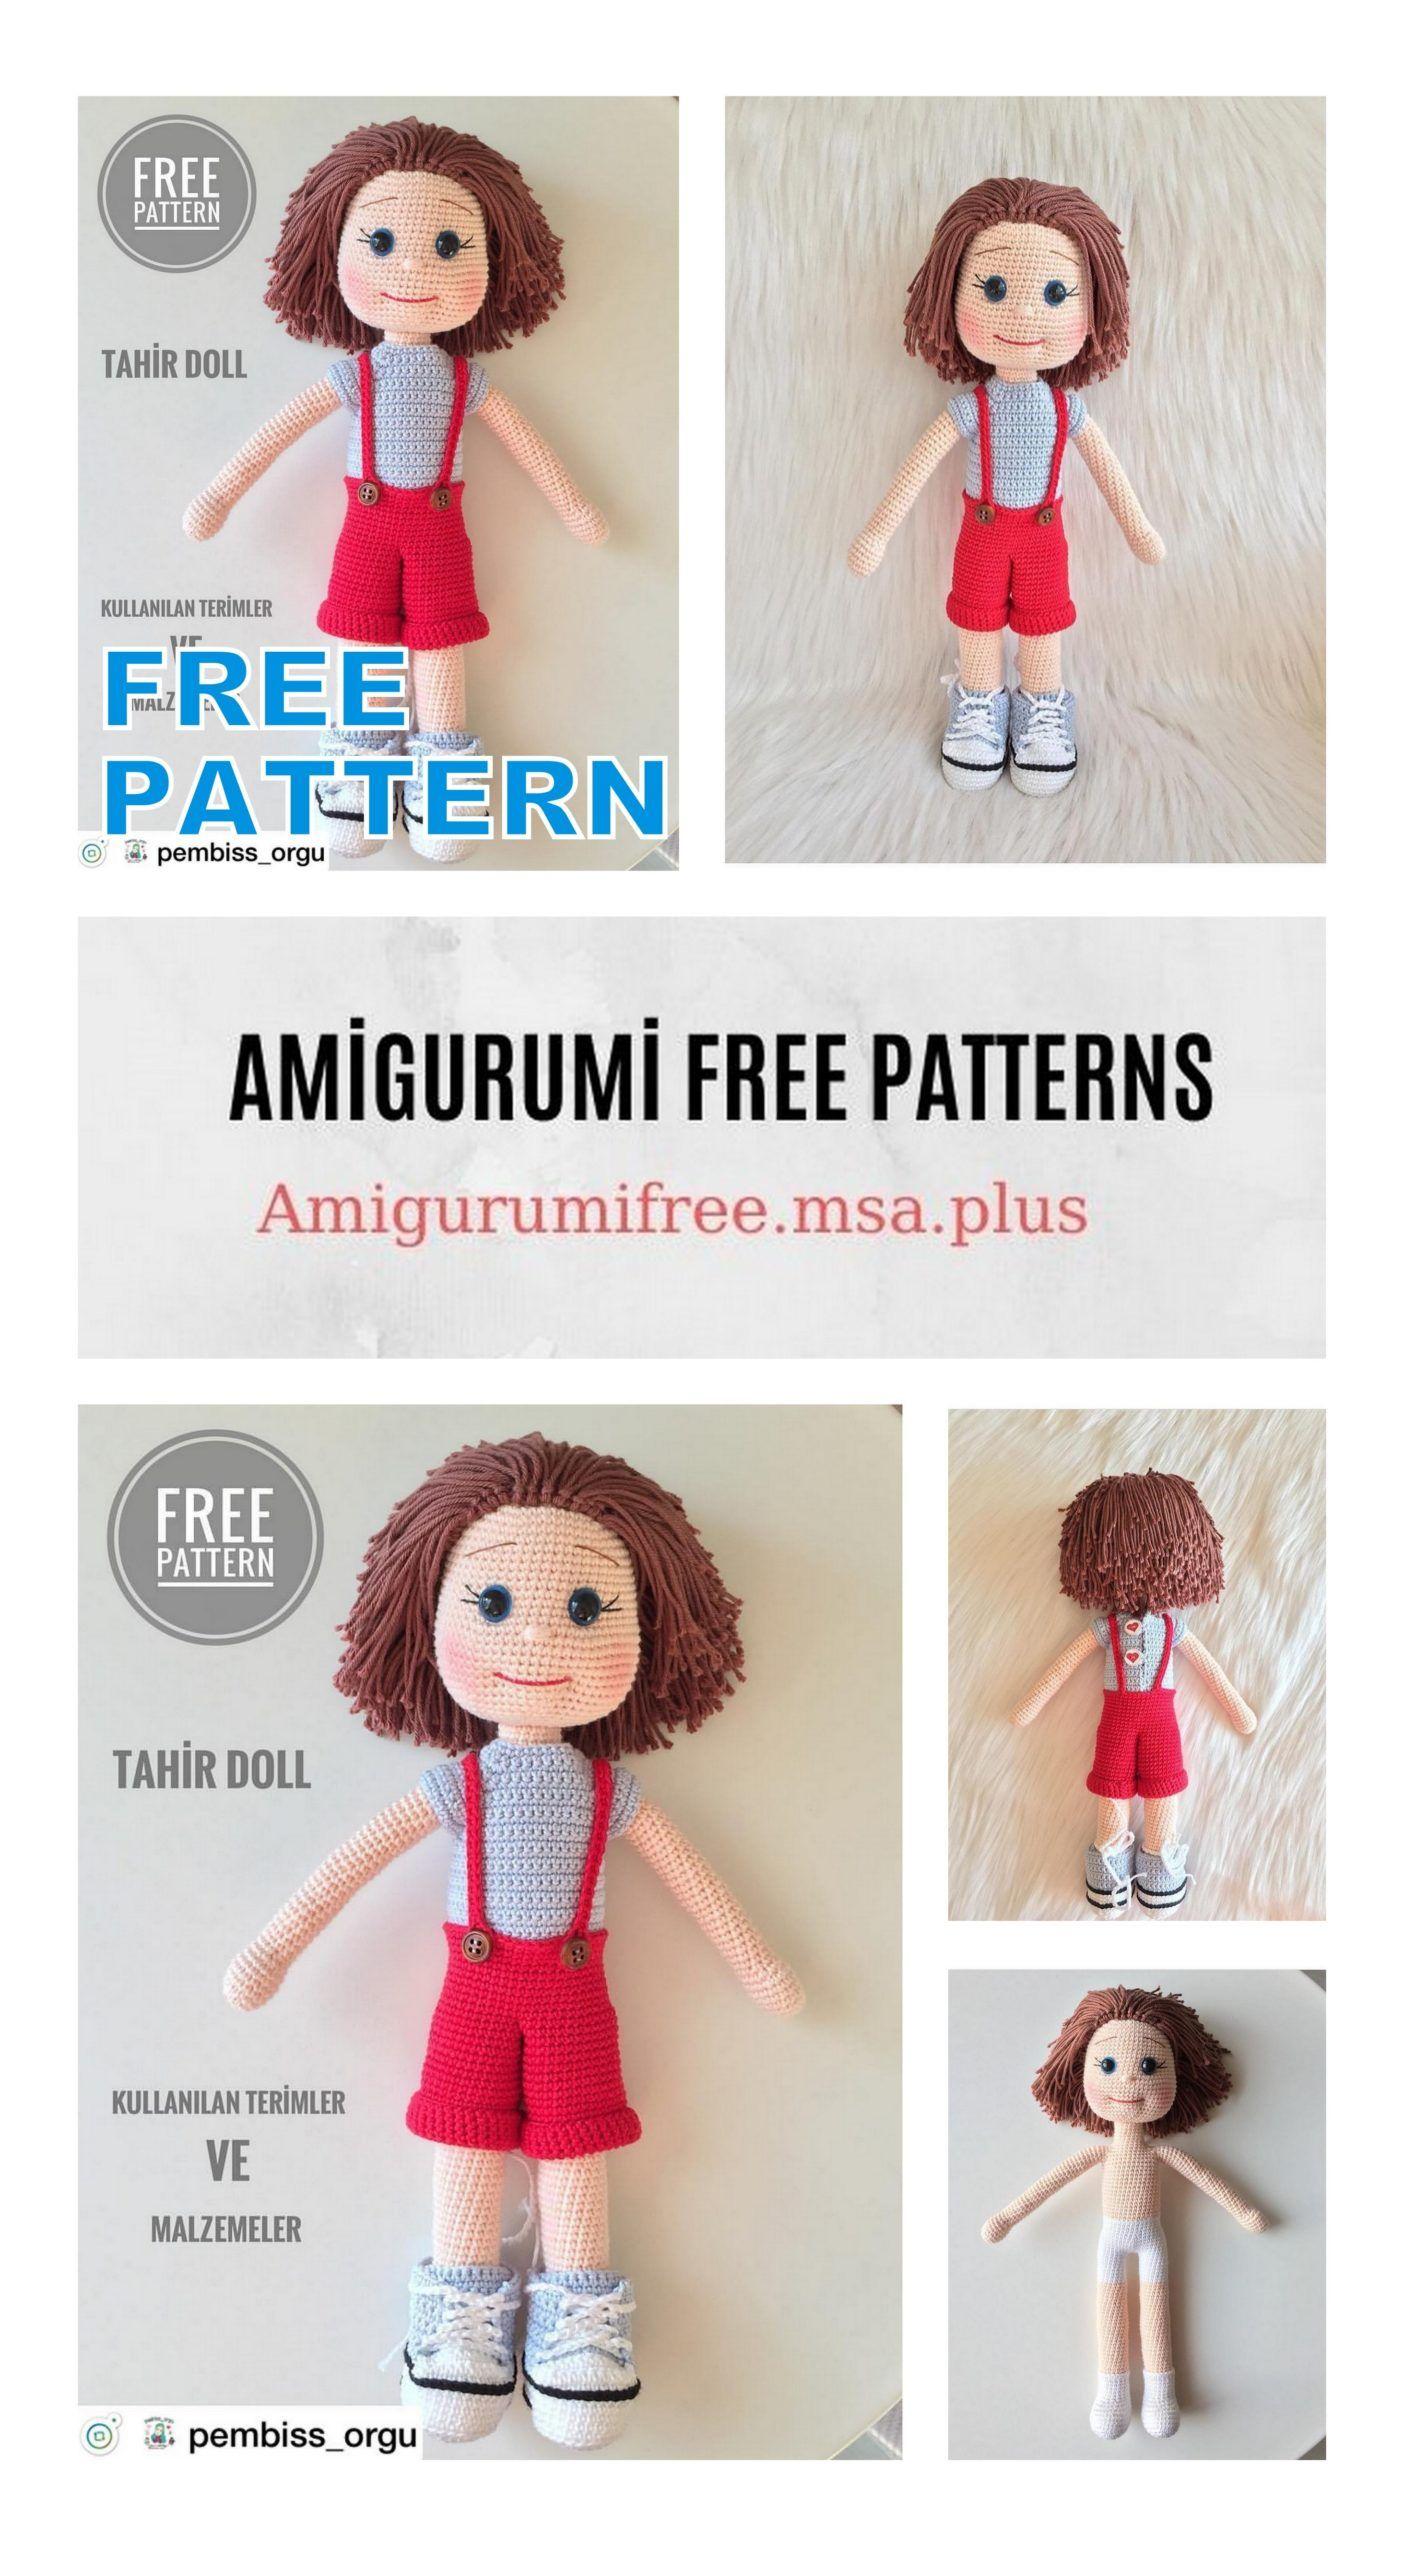 10 Top Best Amigurumi Doll Free Crochet Patterns in 2020 ... | 2560x1404